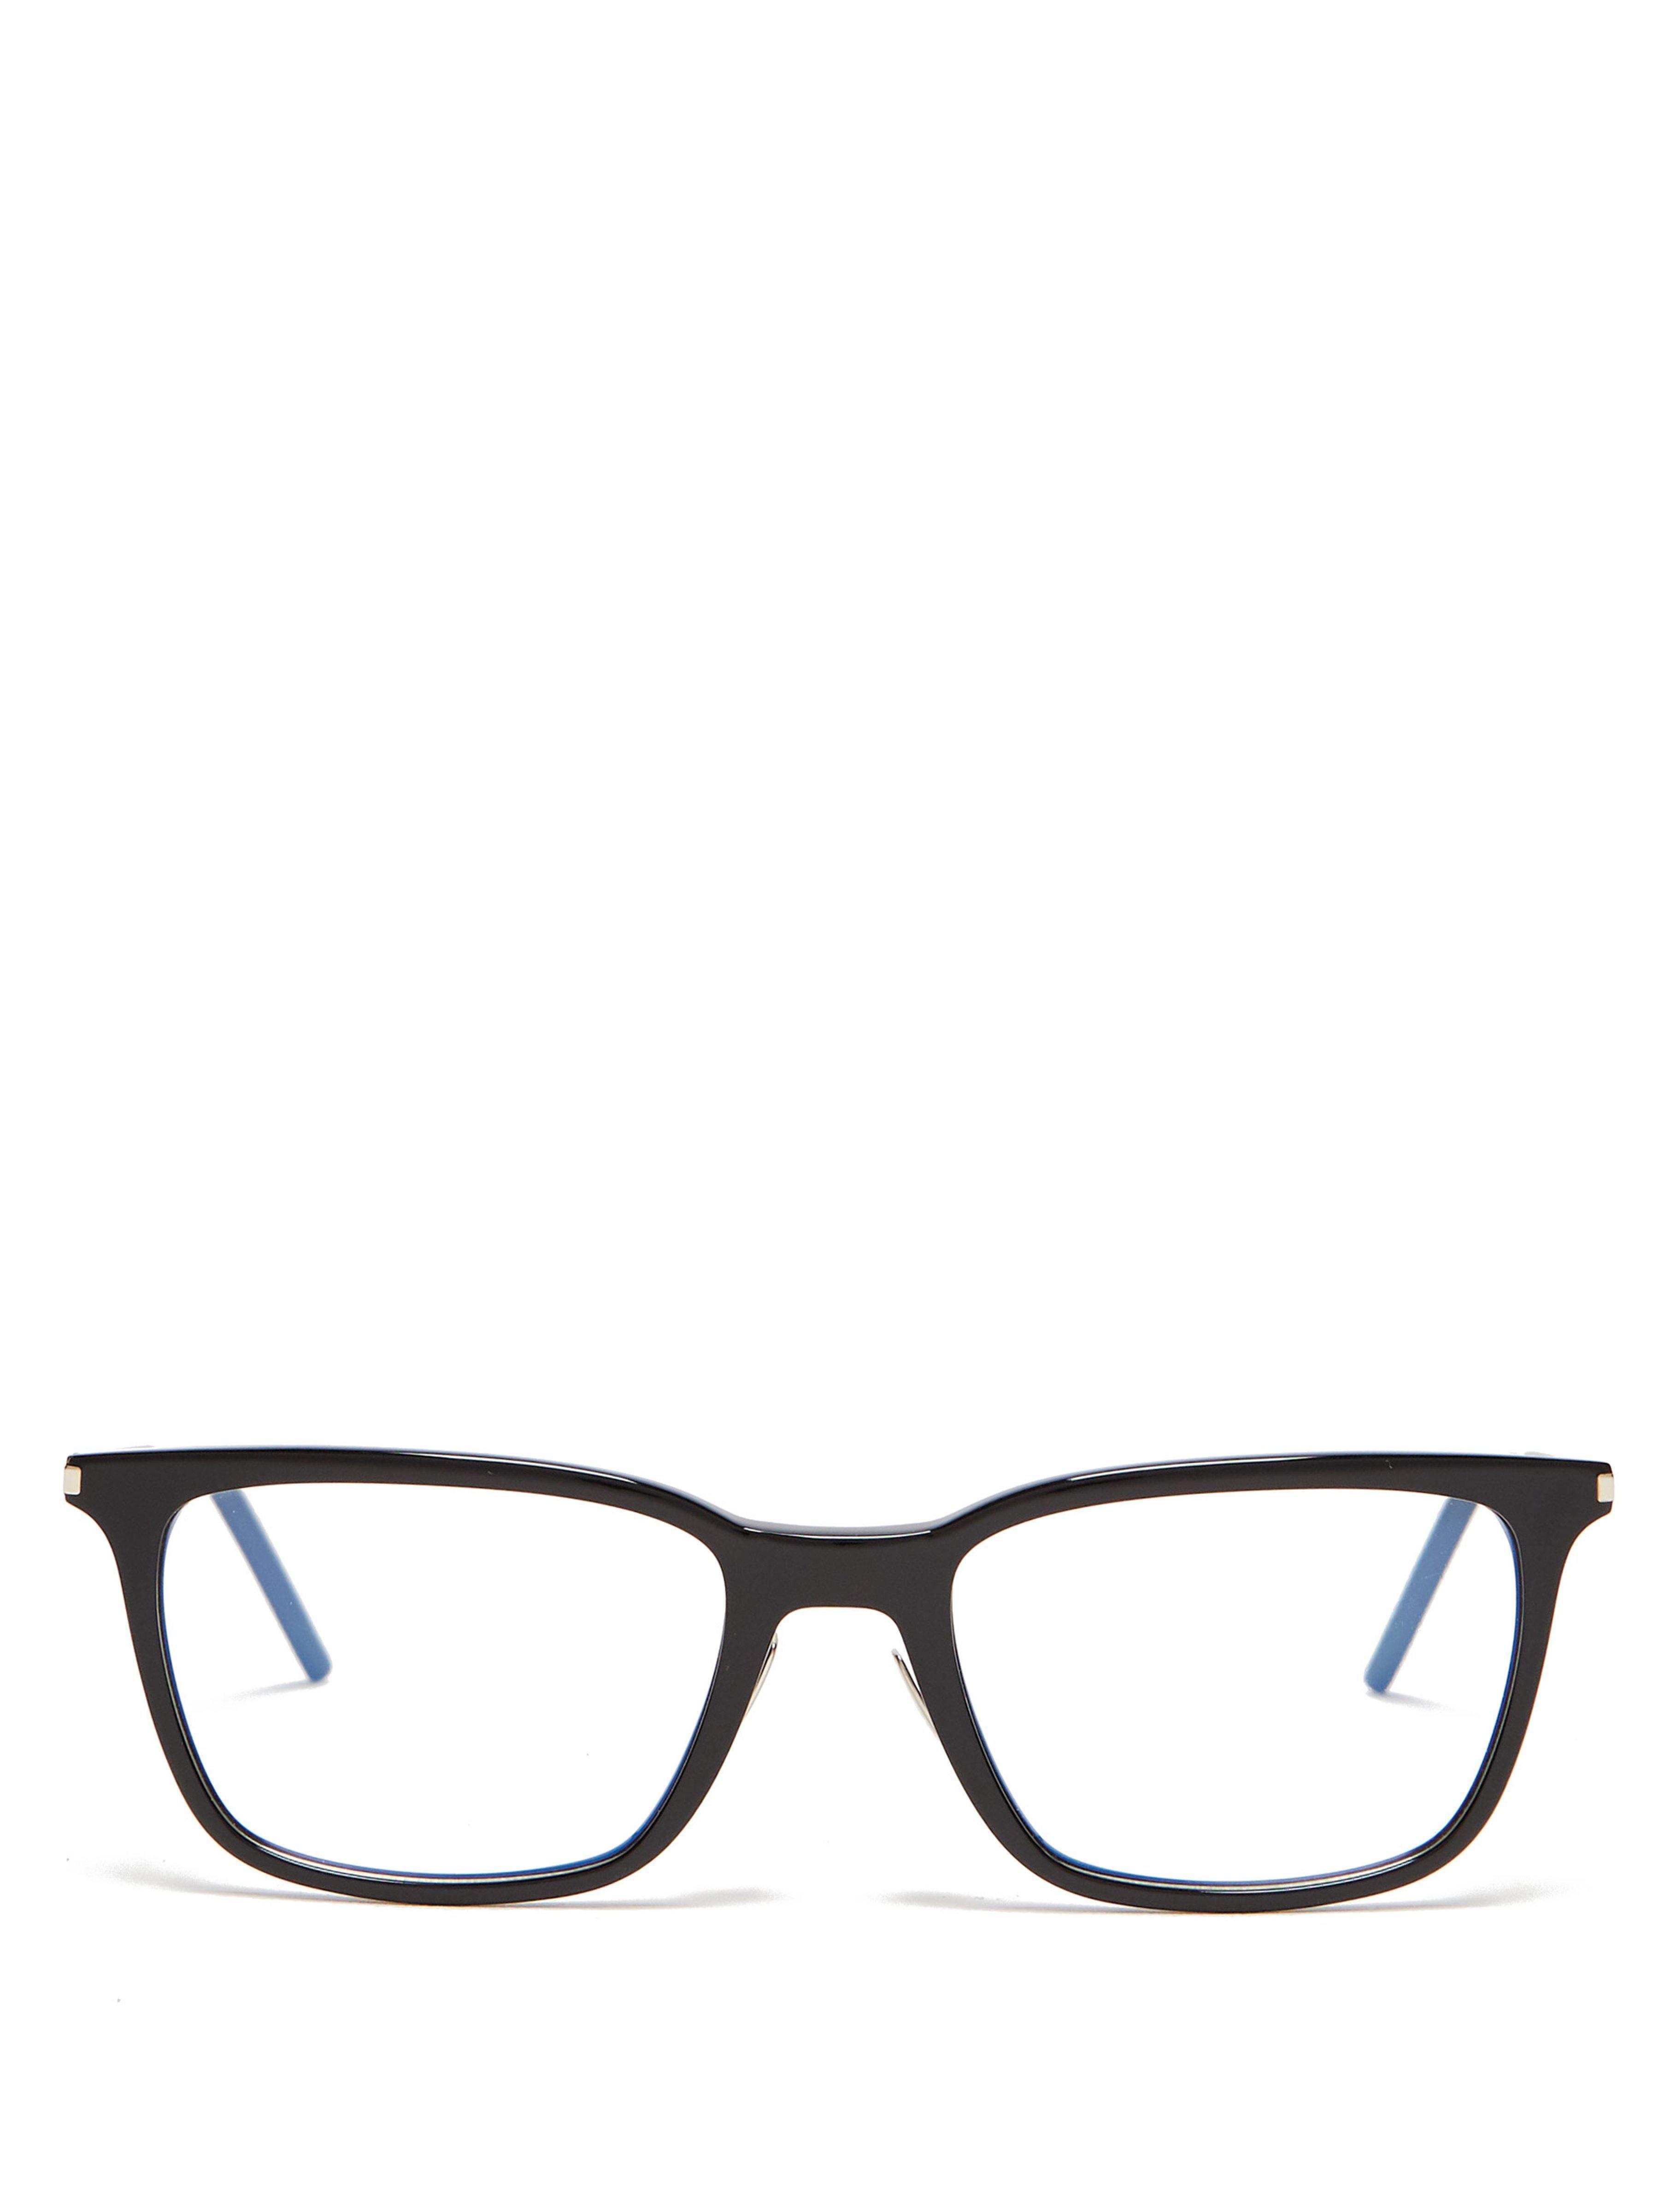 d042beb2dcc2 Saint Laurent Square Frame Acetate Glasses in Black for Men - Lyst